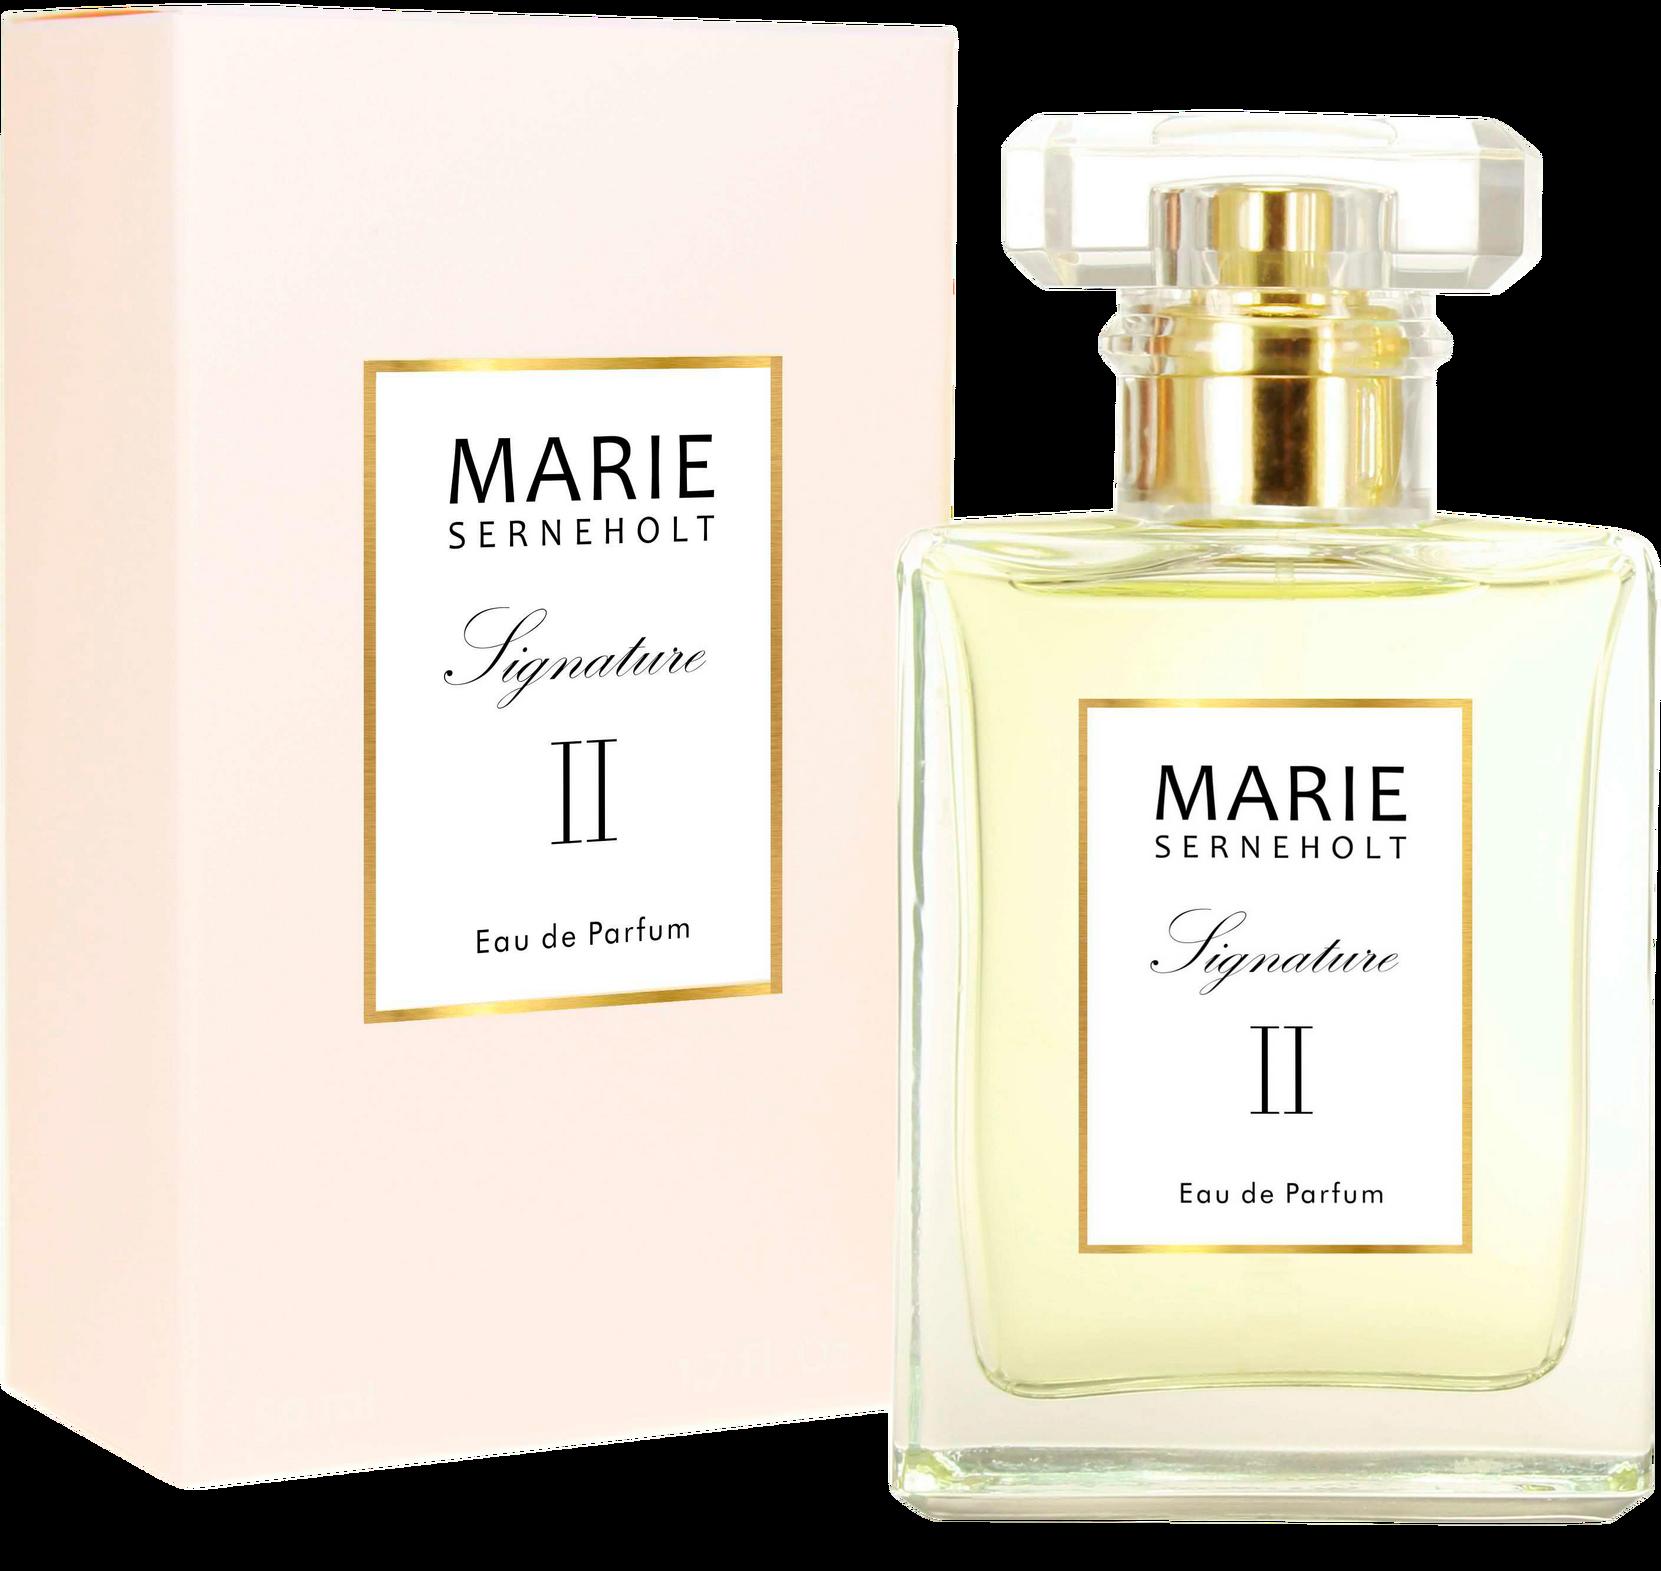 Signature II Edp 50ml Spray Marie Serneholt Parfumer til Kvinder i